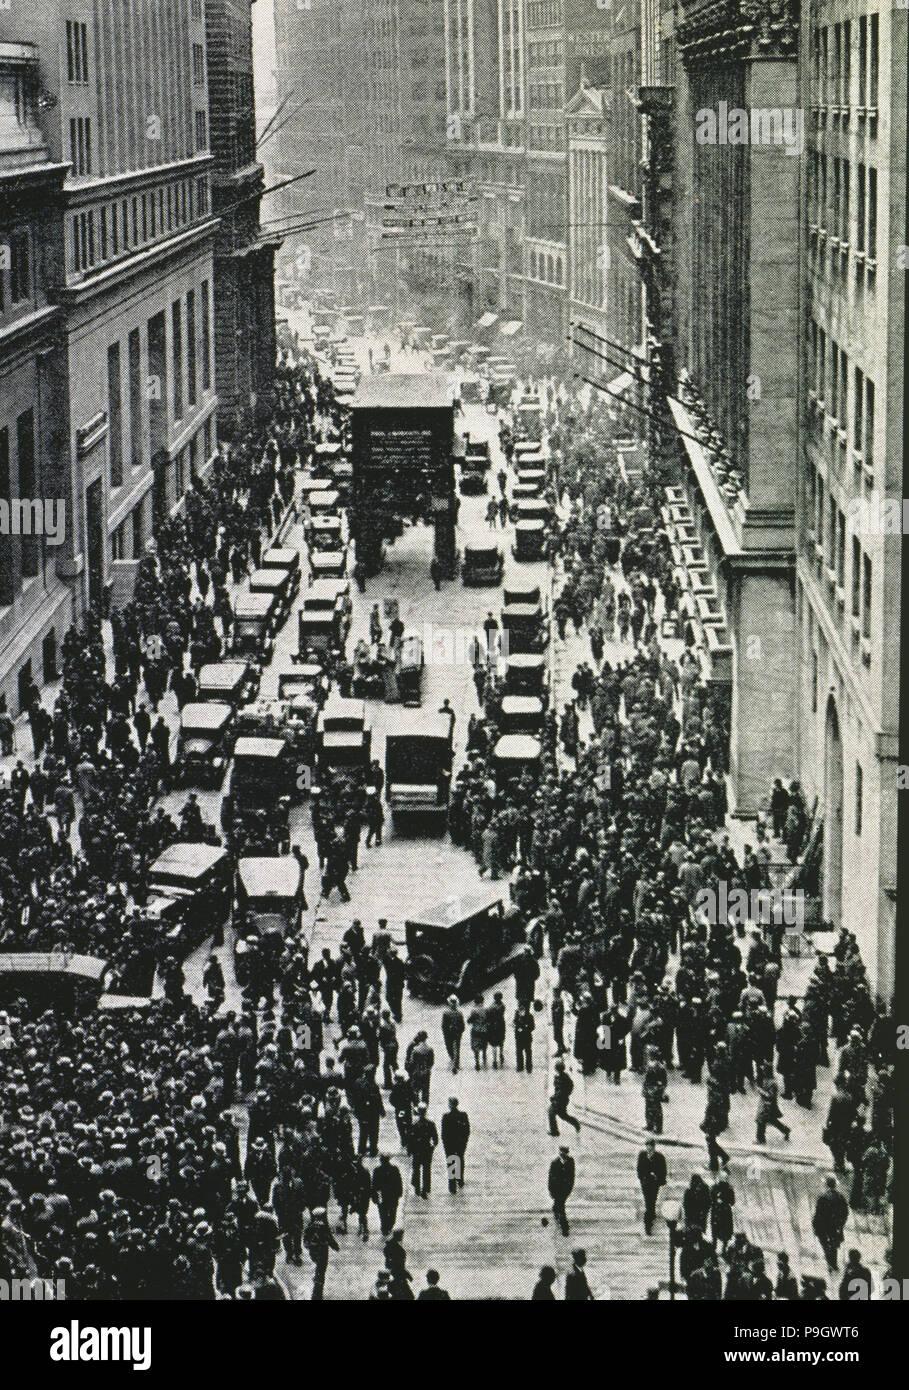 Wall Street Crash New York 1929 Stock Photos & Wall Street ...